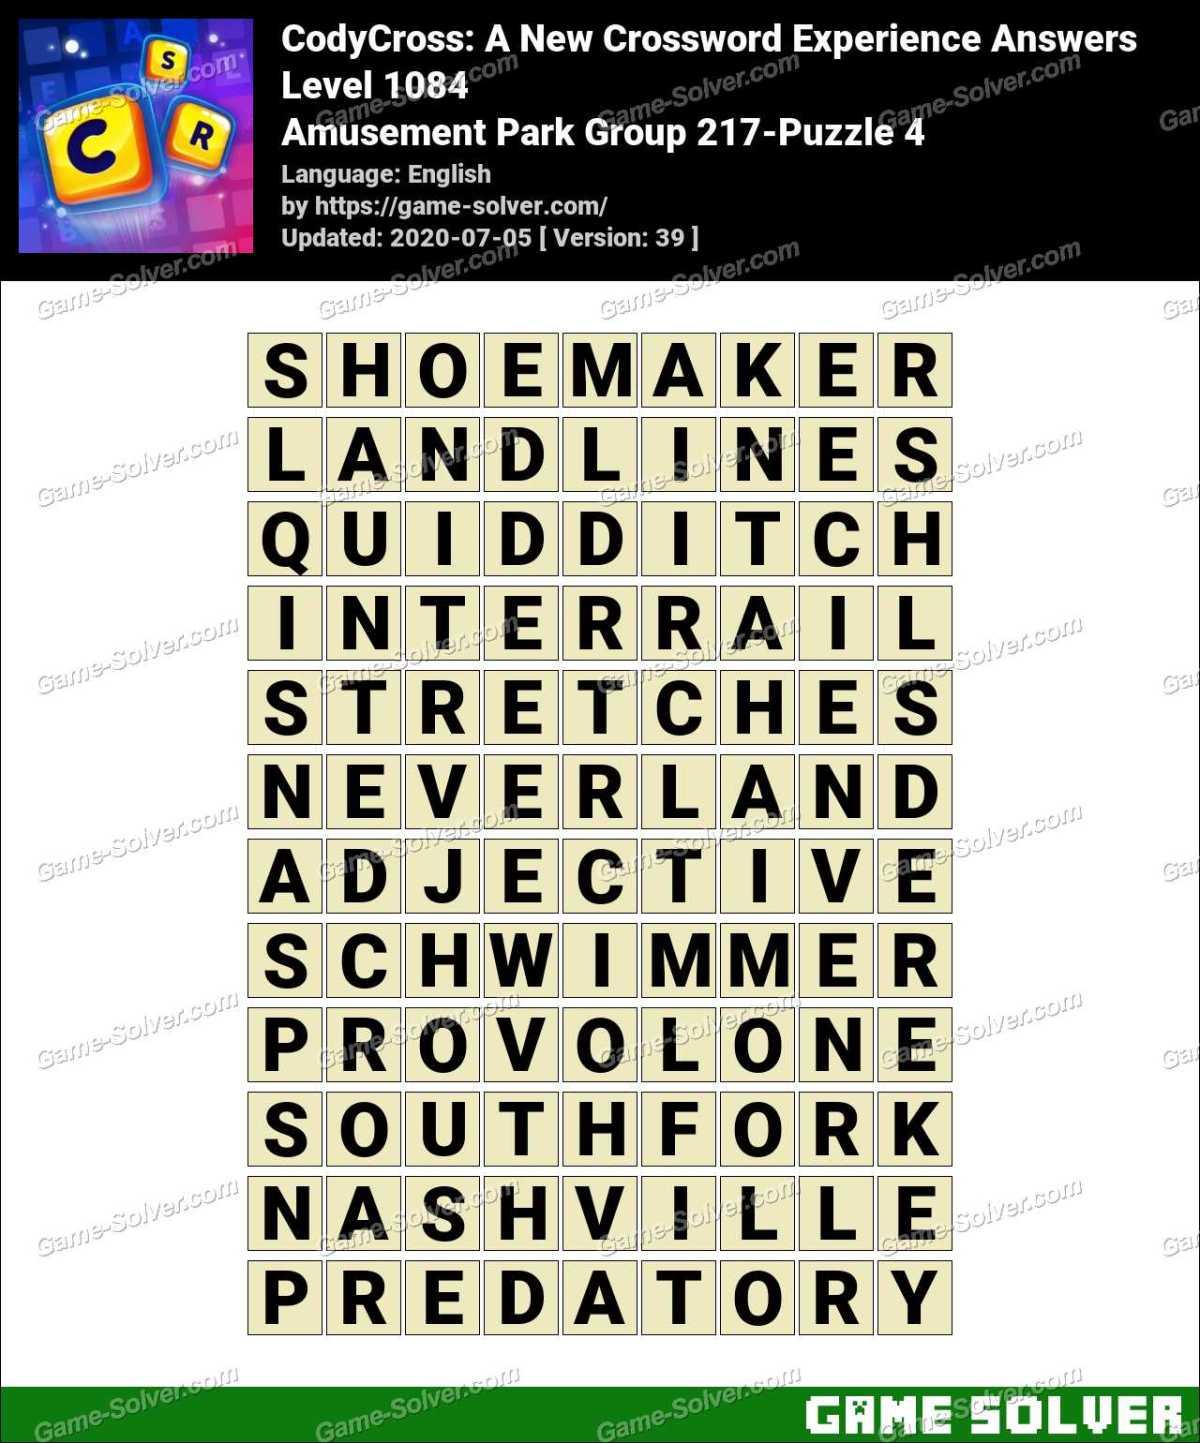 CodyCross Amusement Park Group 217-Puzzle 4 Answers